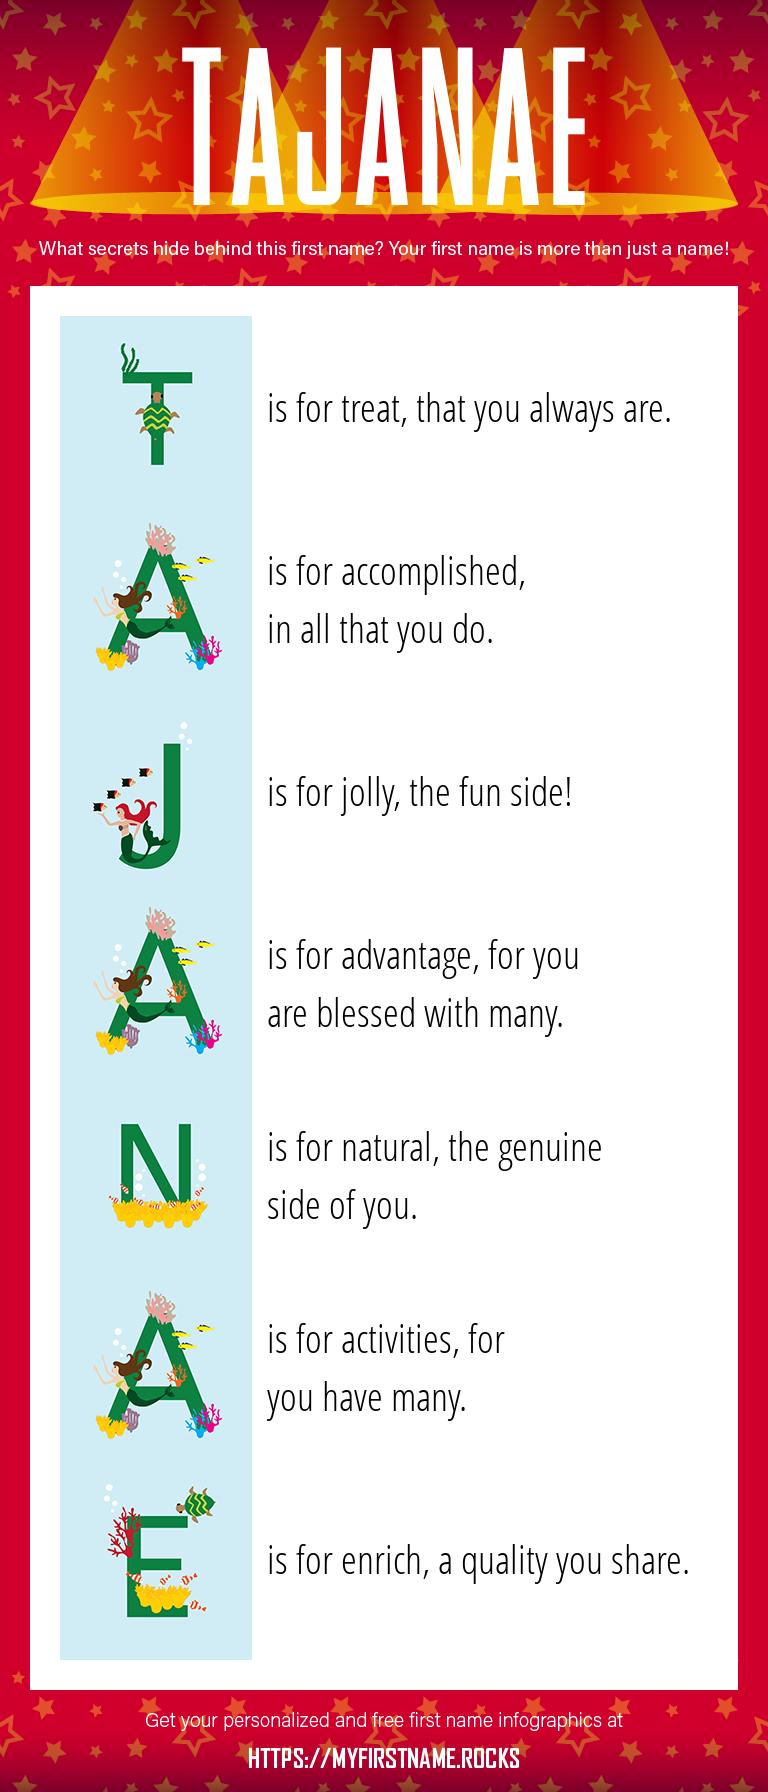 Tajanae Infographics